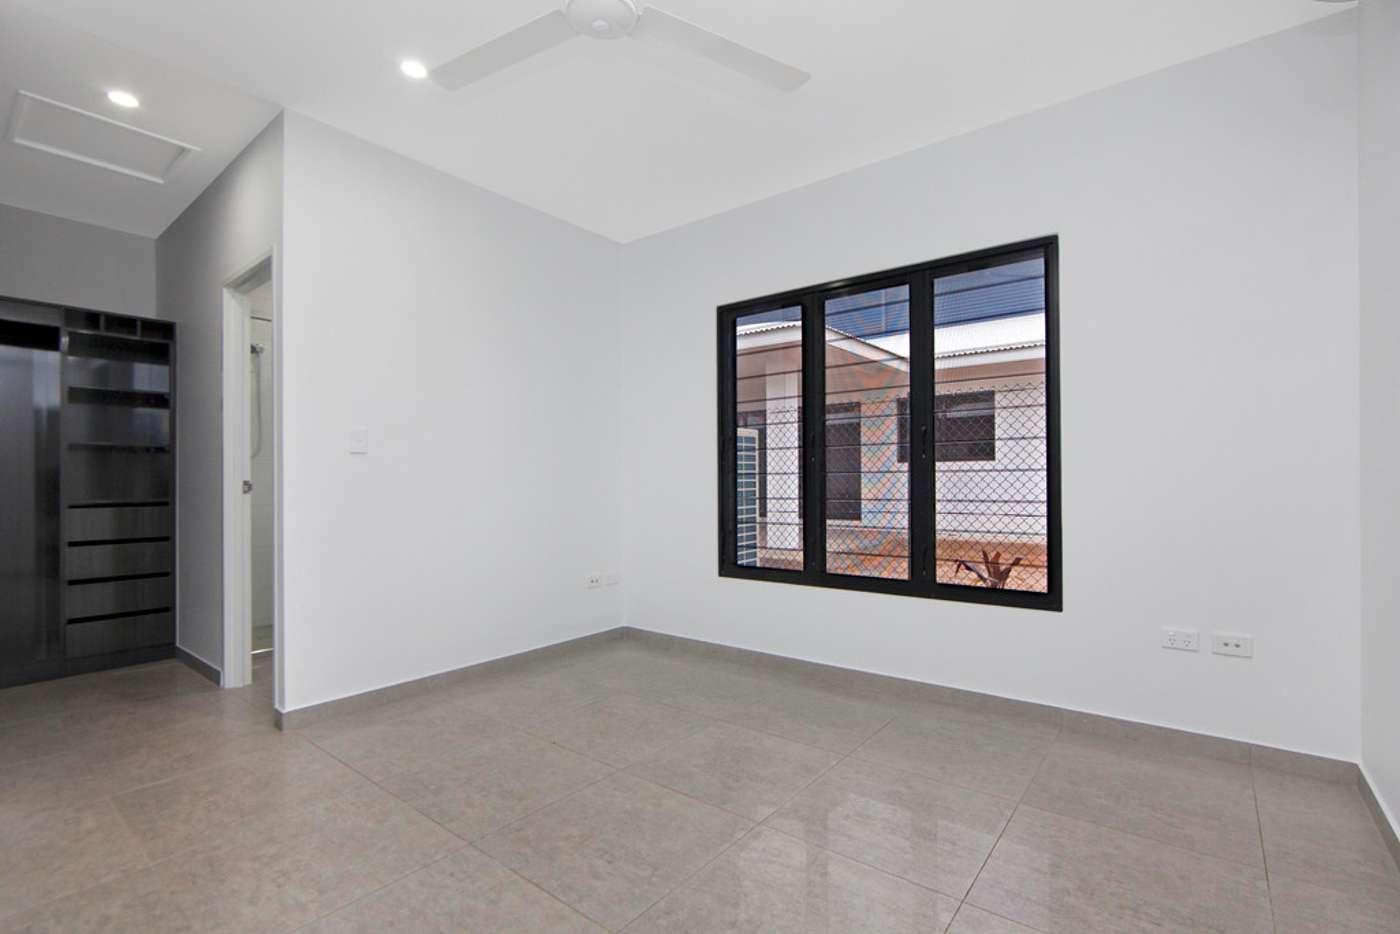 Sixth view of Homely unit listing, 1/23 Bevan Street, Muirhead NT 810